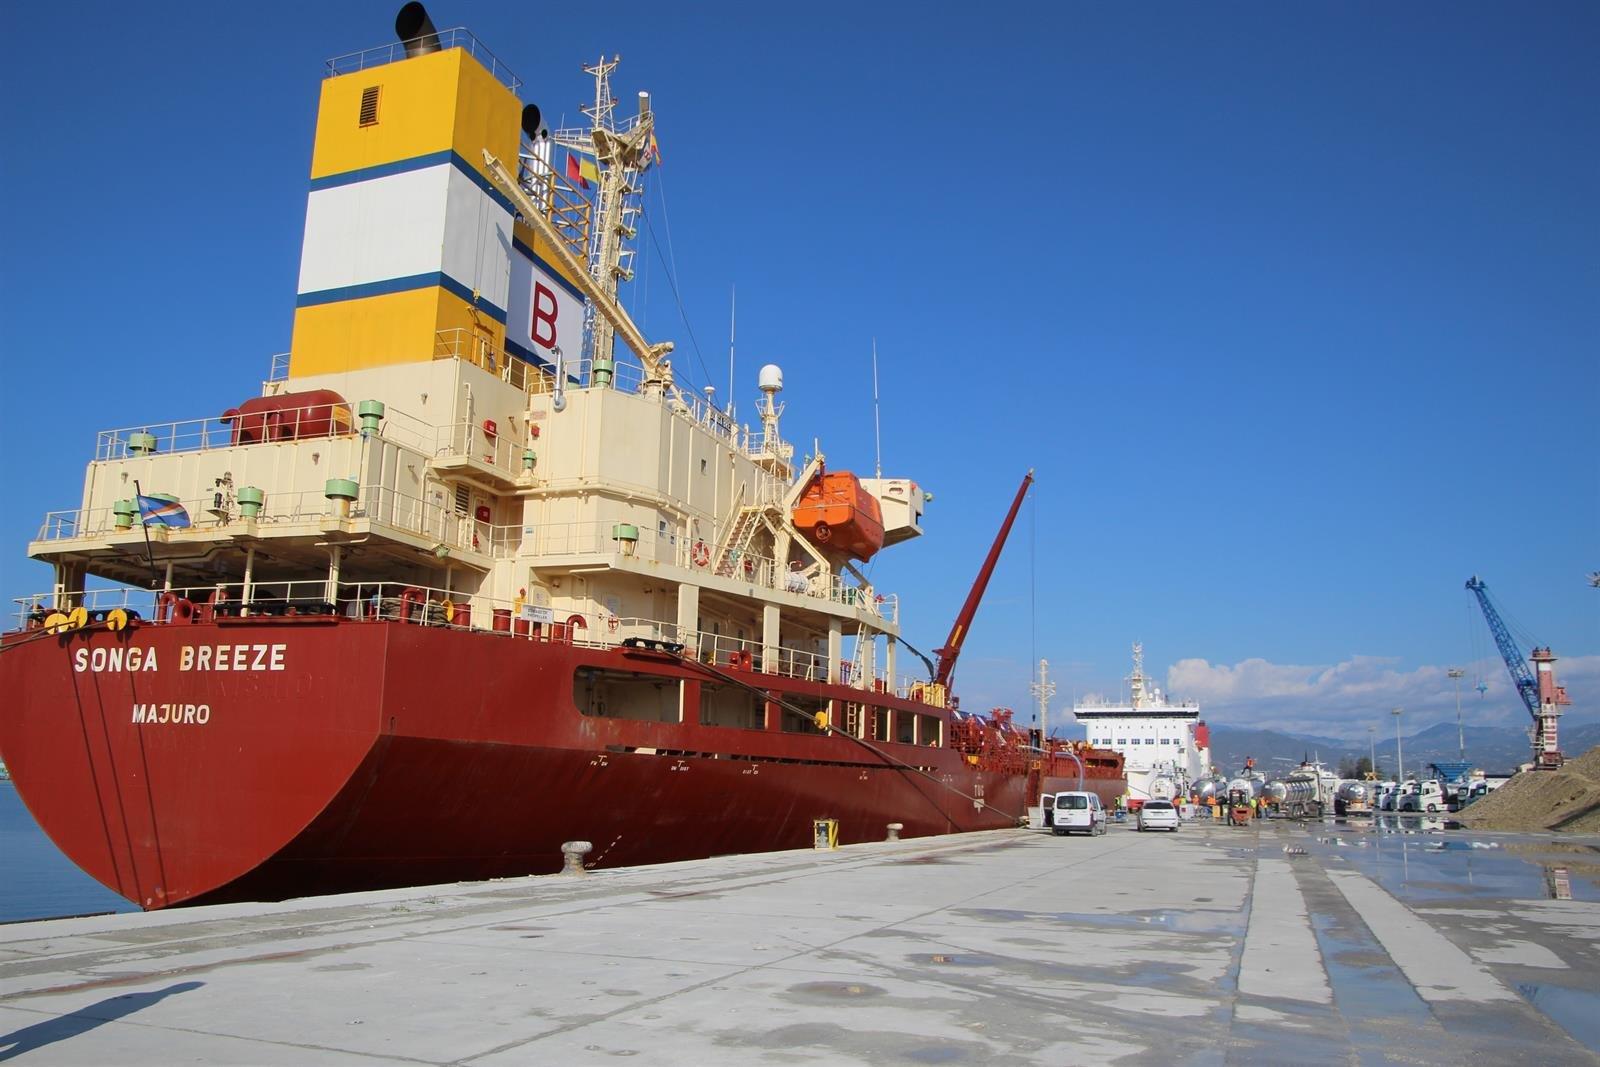 La provincia factura 366 millones en exportaciones en el primer trimestre de 2020